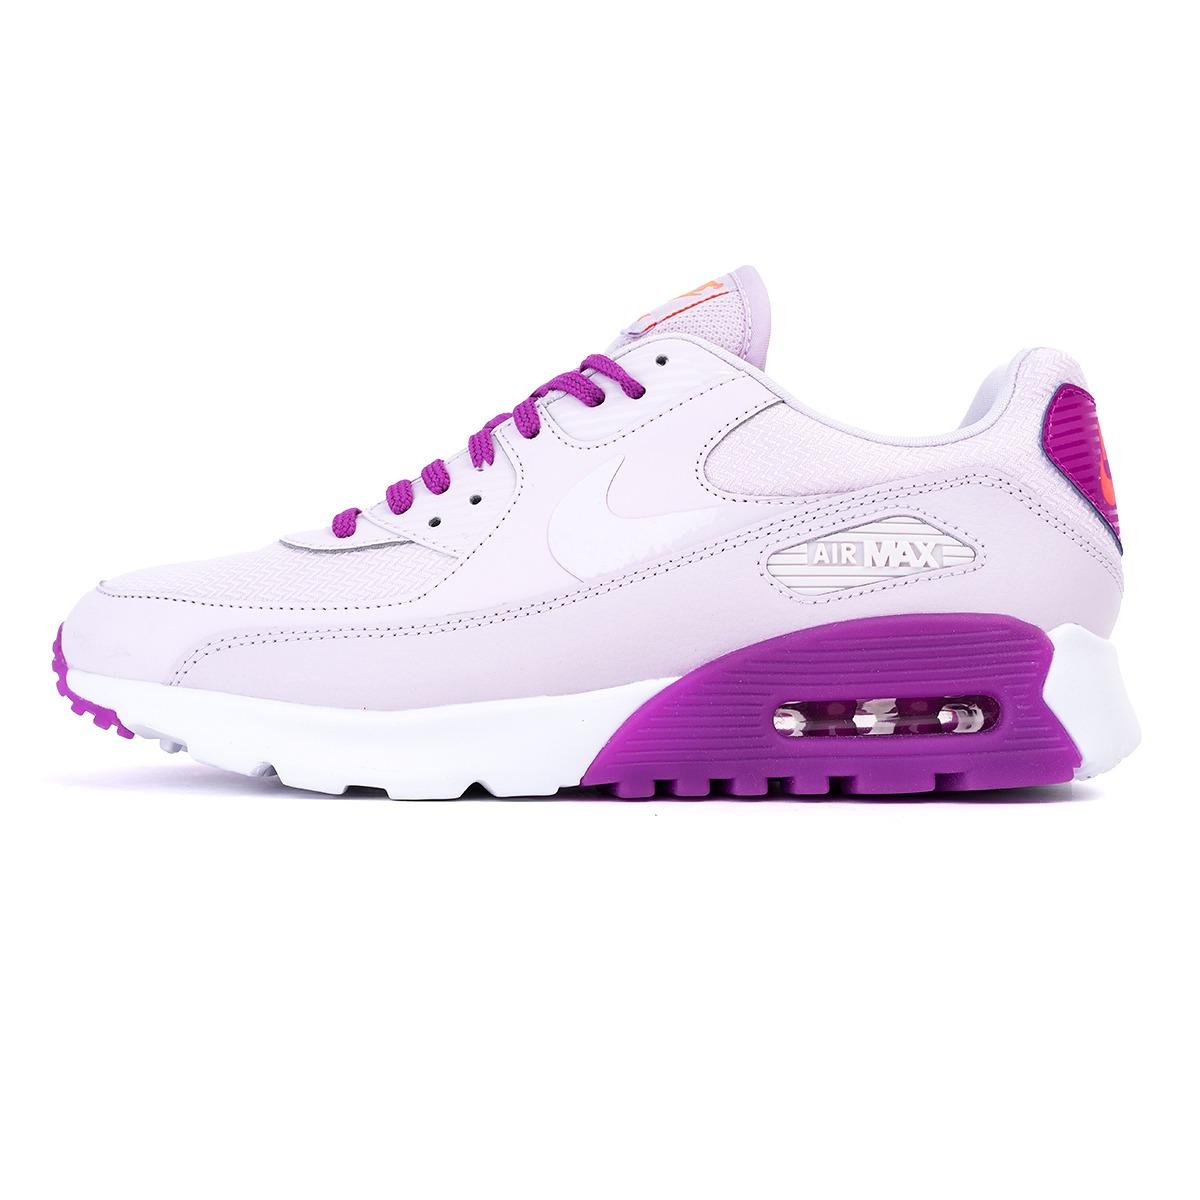 a96d61029f9 zapatillas nike air max 90 ult. essential. mujer. original. Cargando zoom.